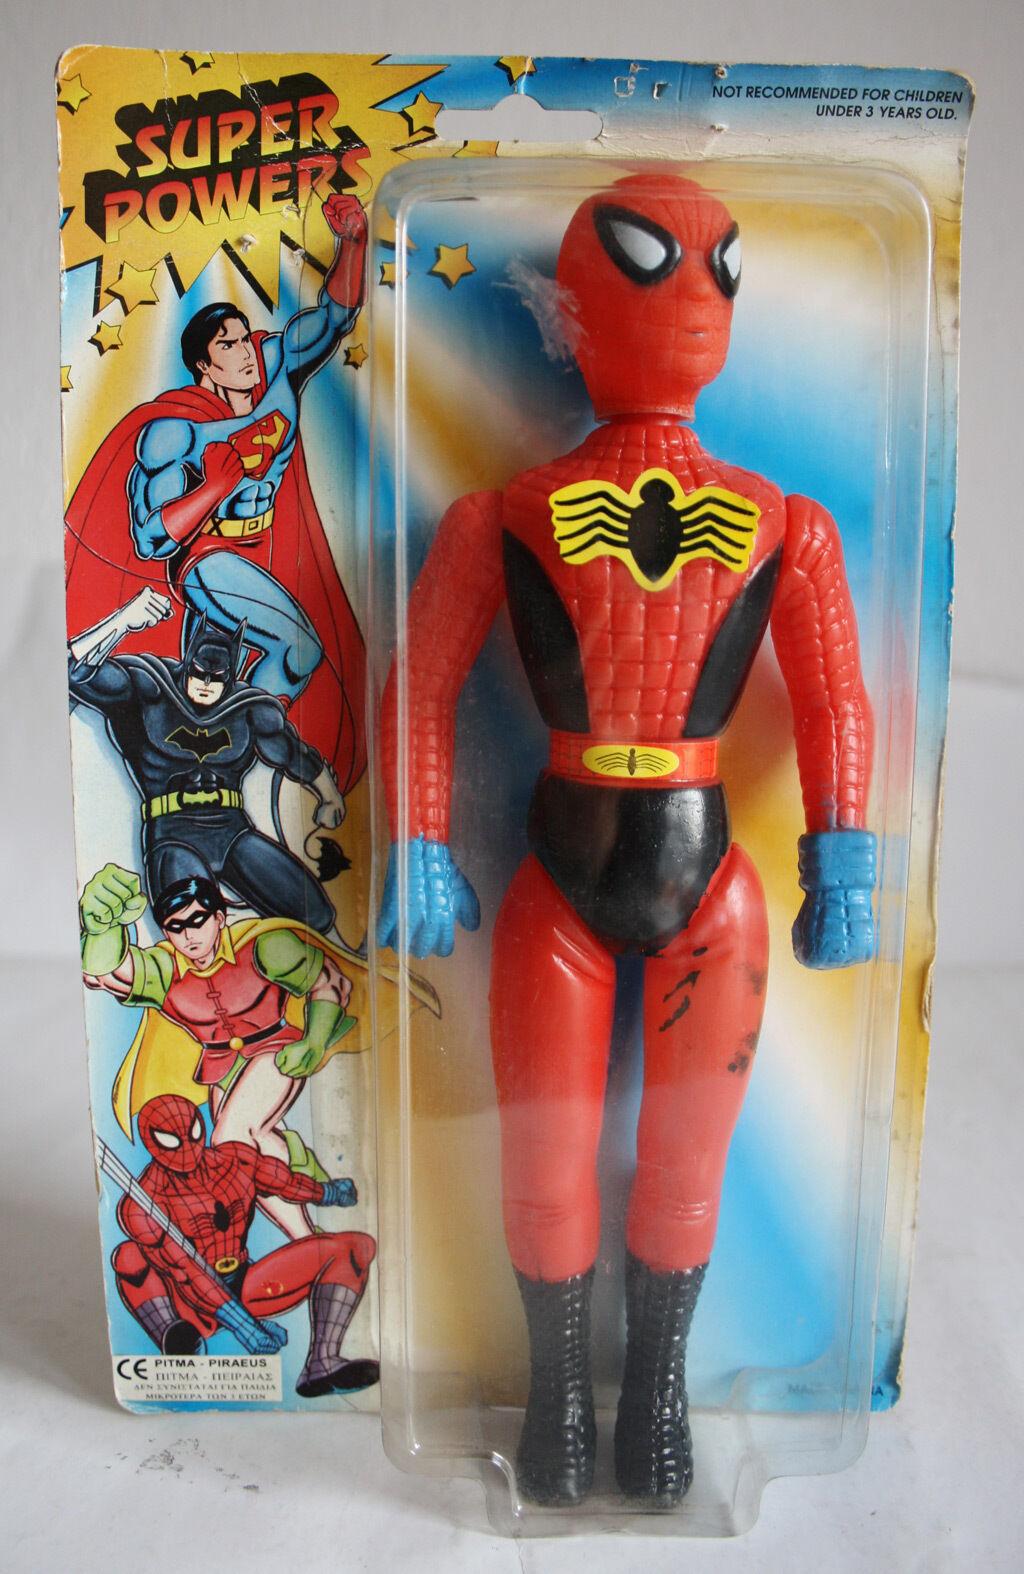 RARE RARE RARE VINTAGE 80'S SPIDERMAN FIGURE MEGO KO SUPER POWERS VHTF NEW SEALED MOSC 847725